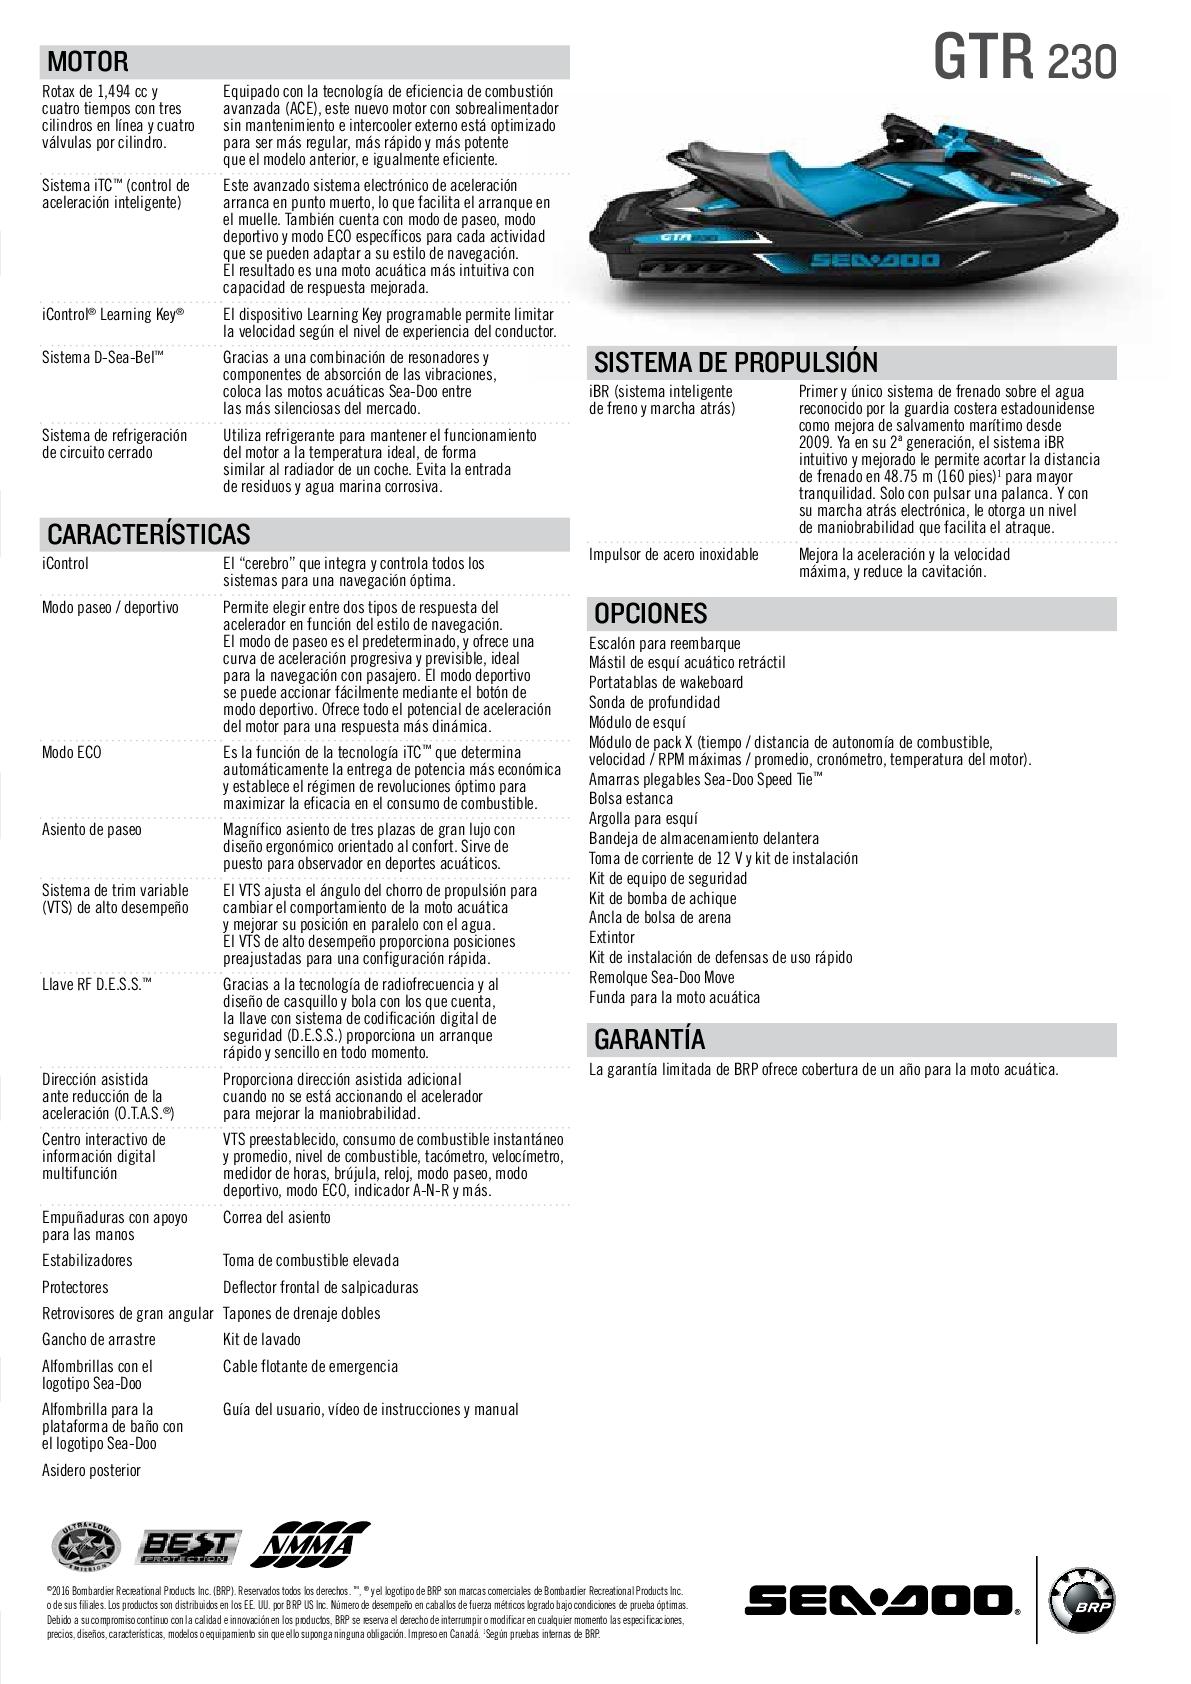 SEA DOO GTR 230HP STD BLACK/GULFSTREAM BLUE